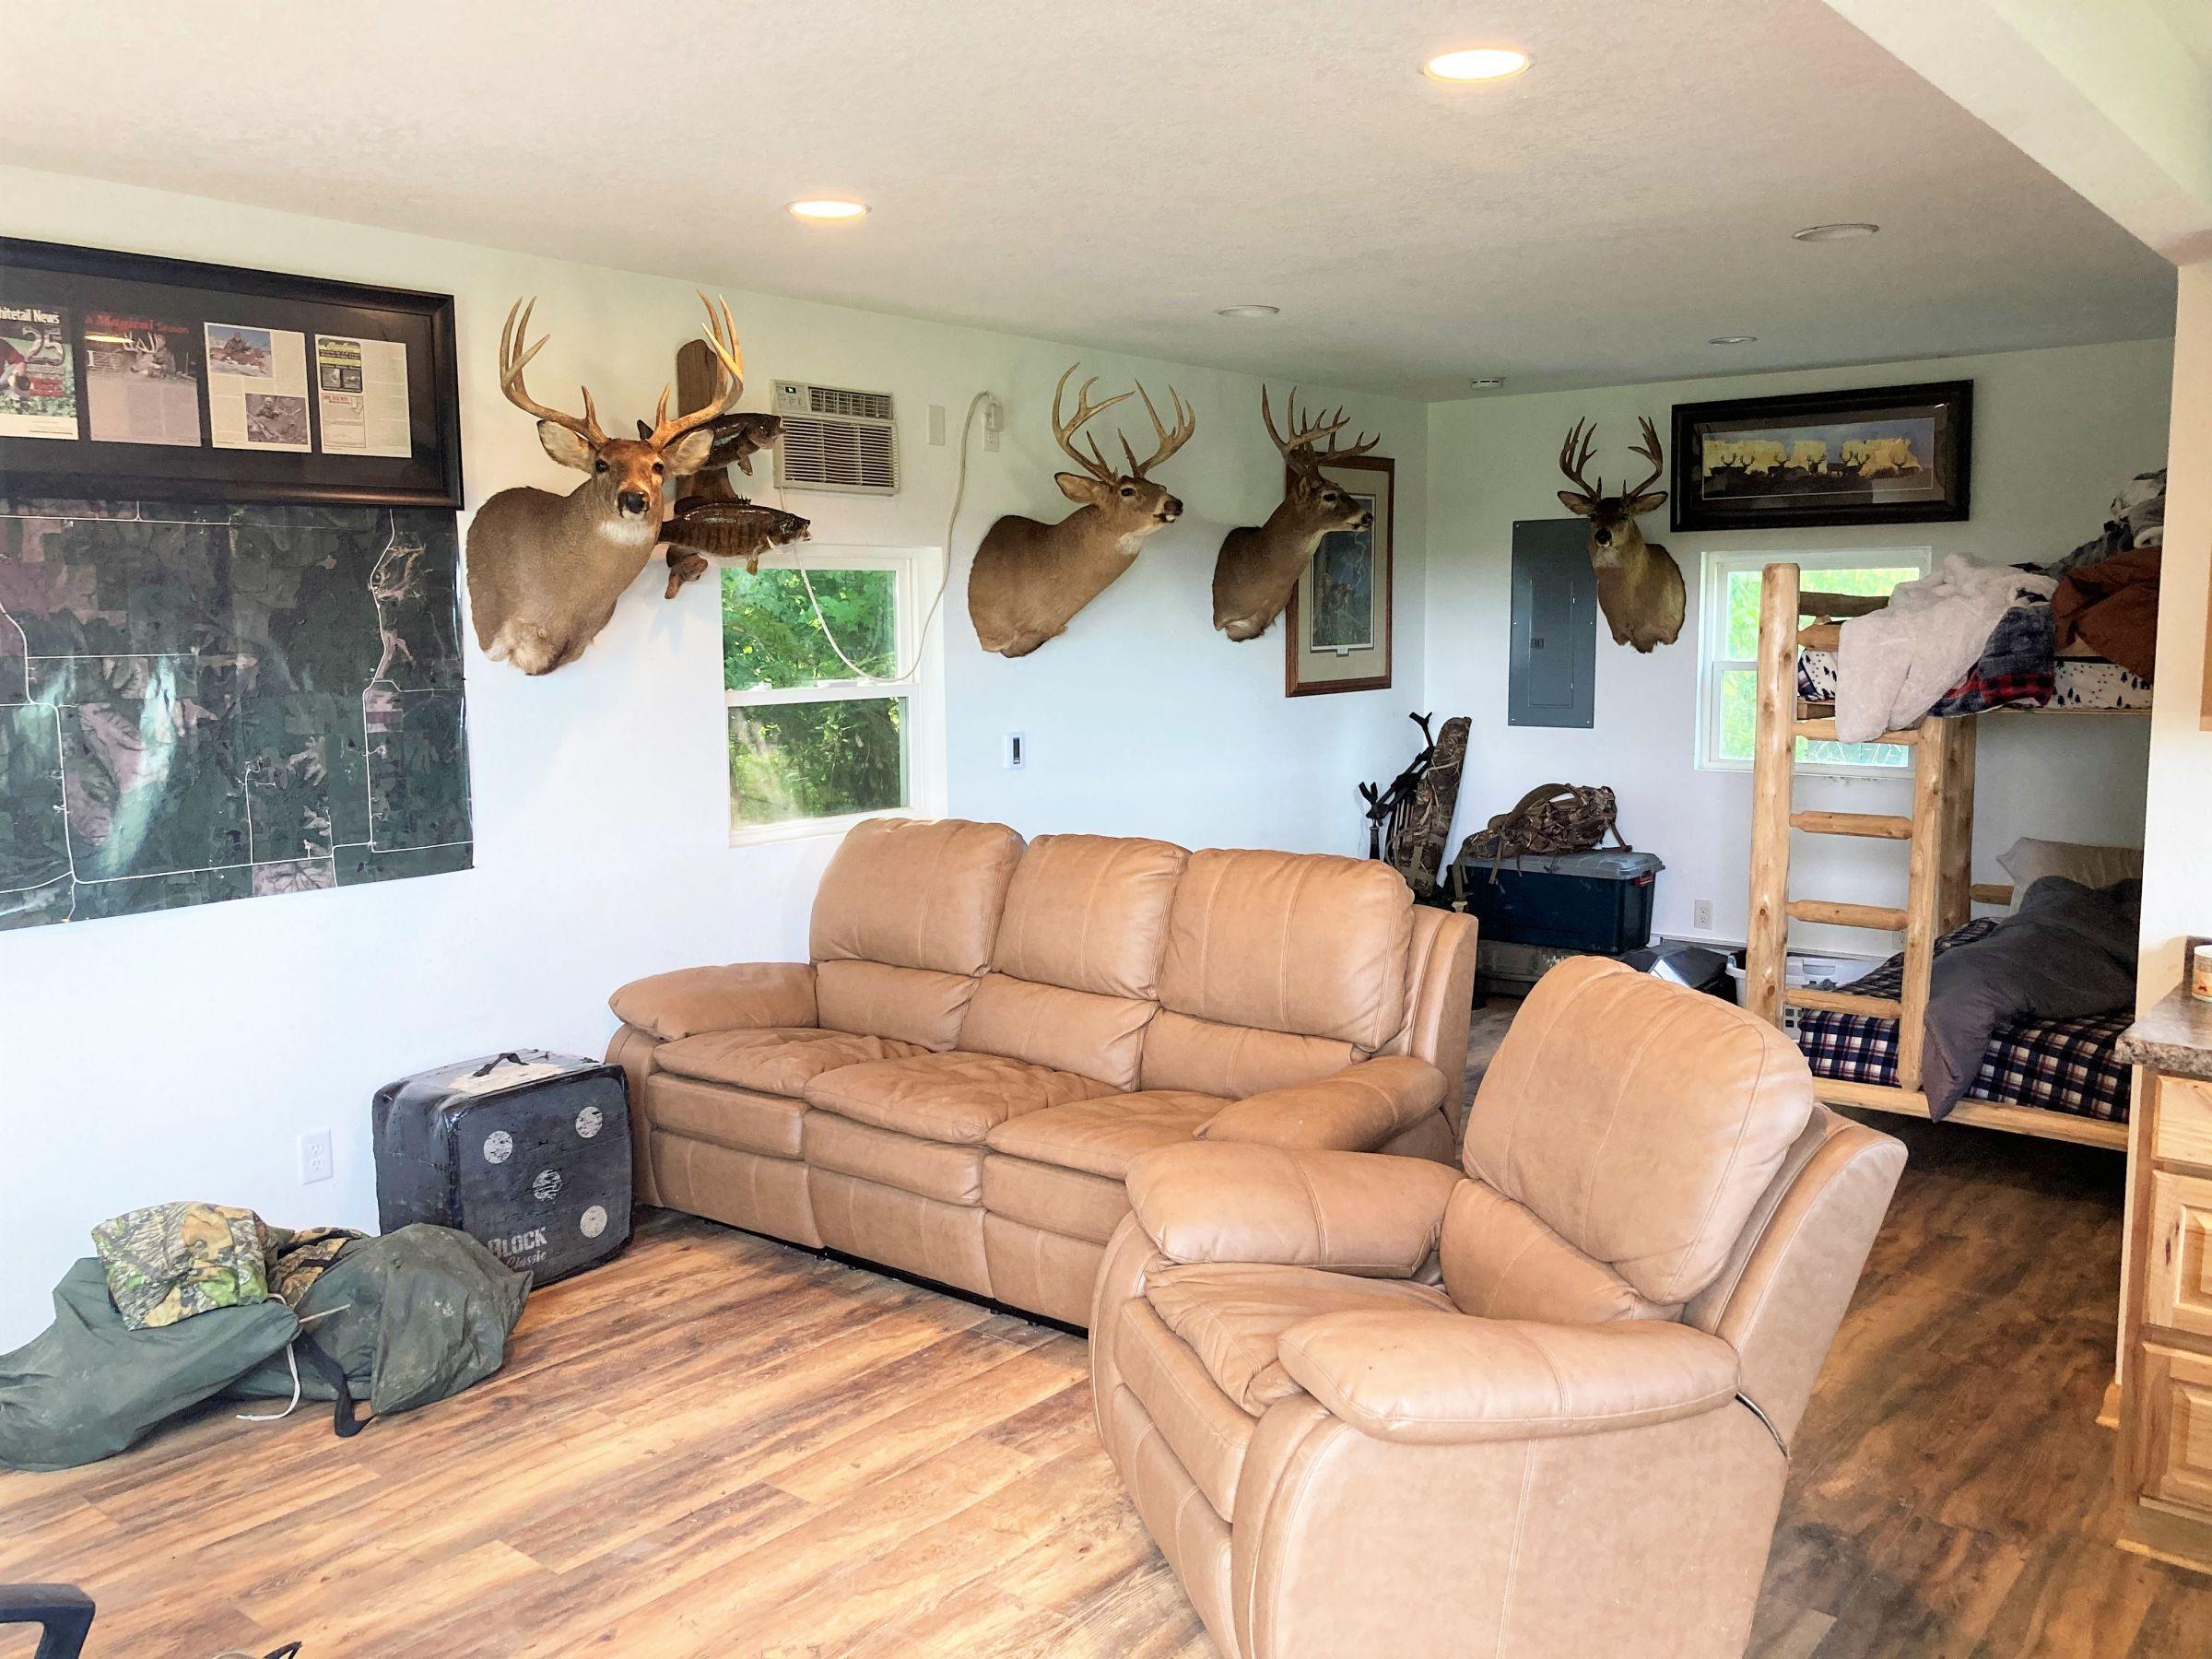 land-clarke-county-iowa-325-acres-listing-number-15416-8-2021-03-18-163324.JPG